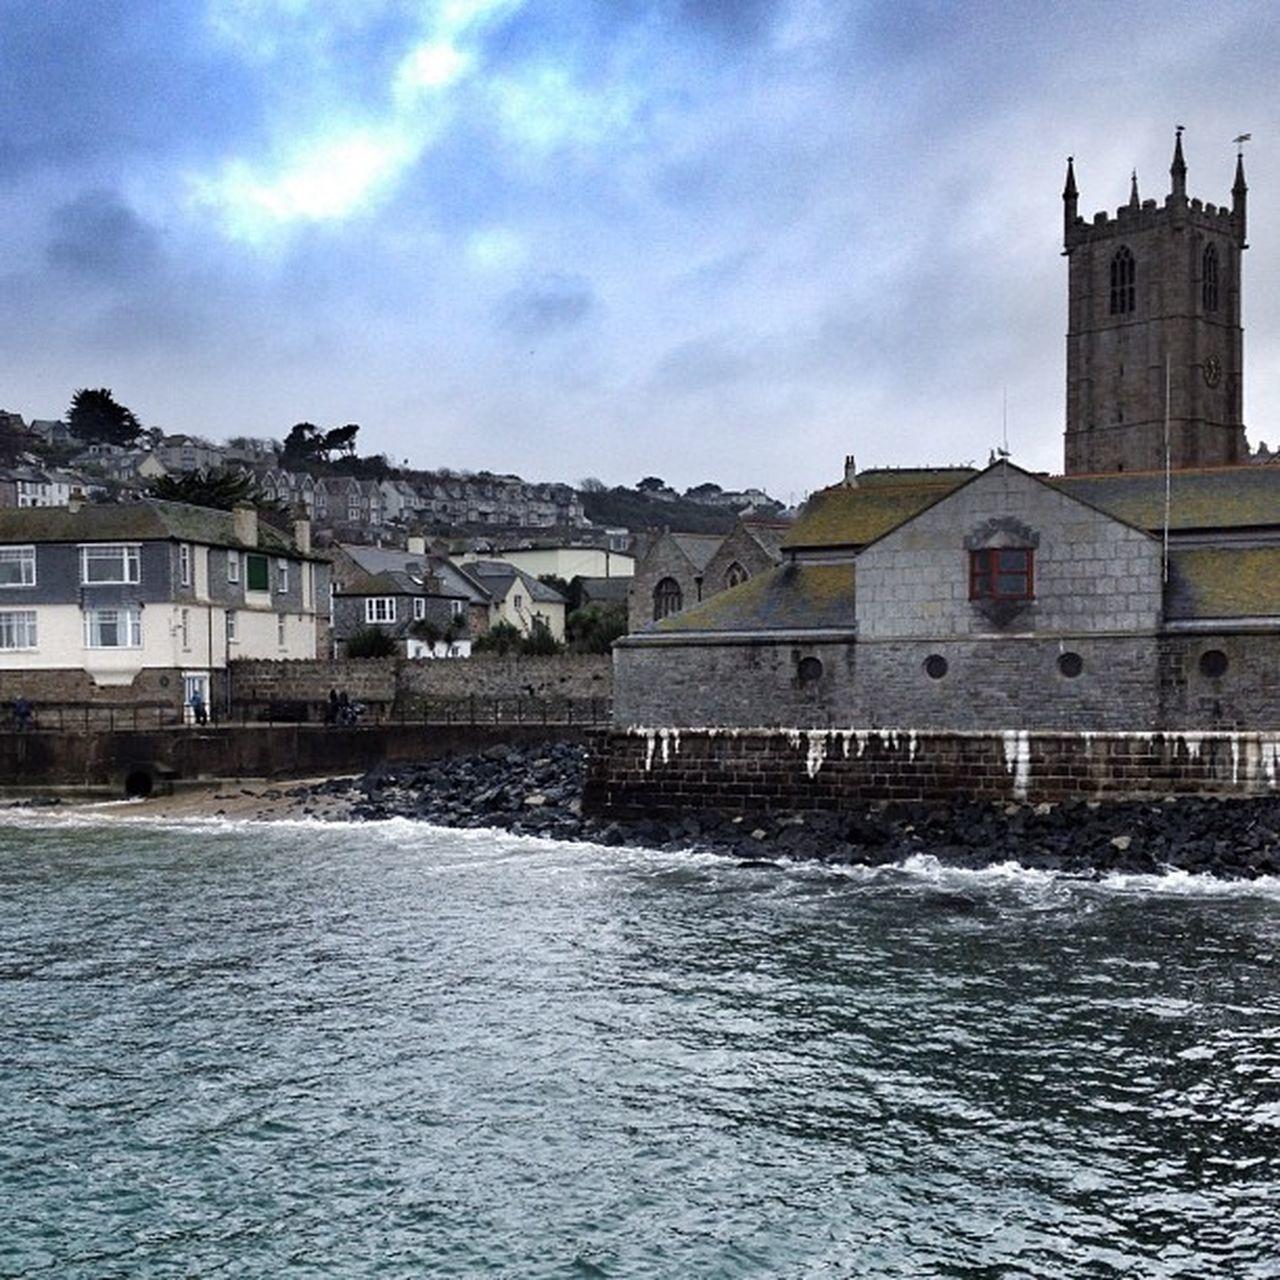 St Ives... #stives #sea #church #cornwall #improvedimage Sea Church Cornwall Improvedimage Stives